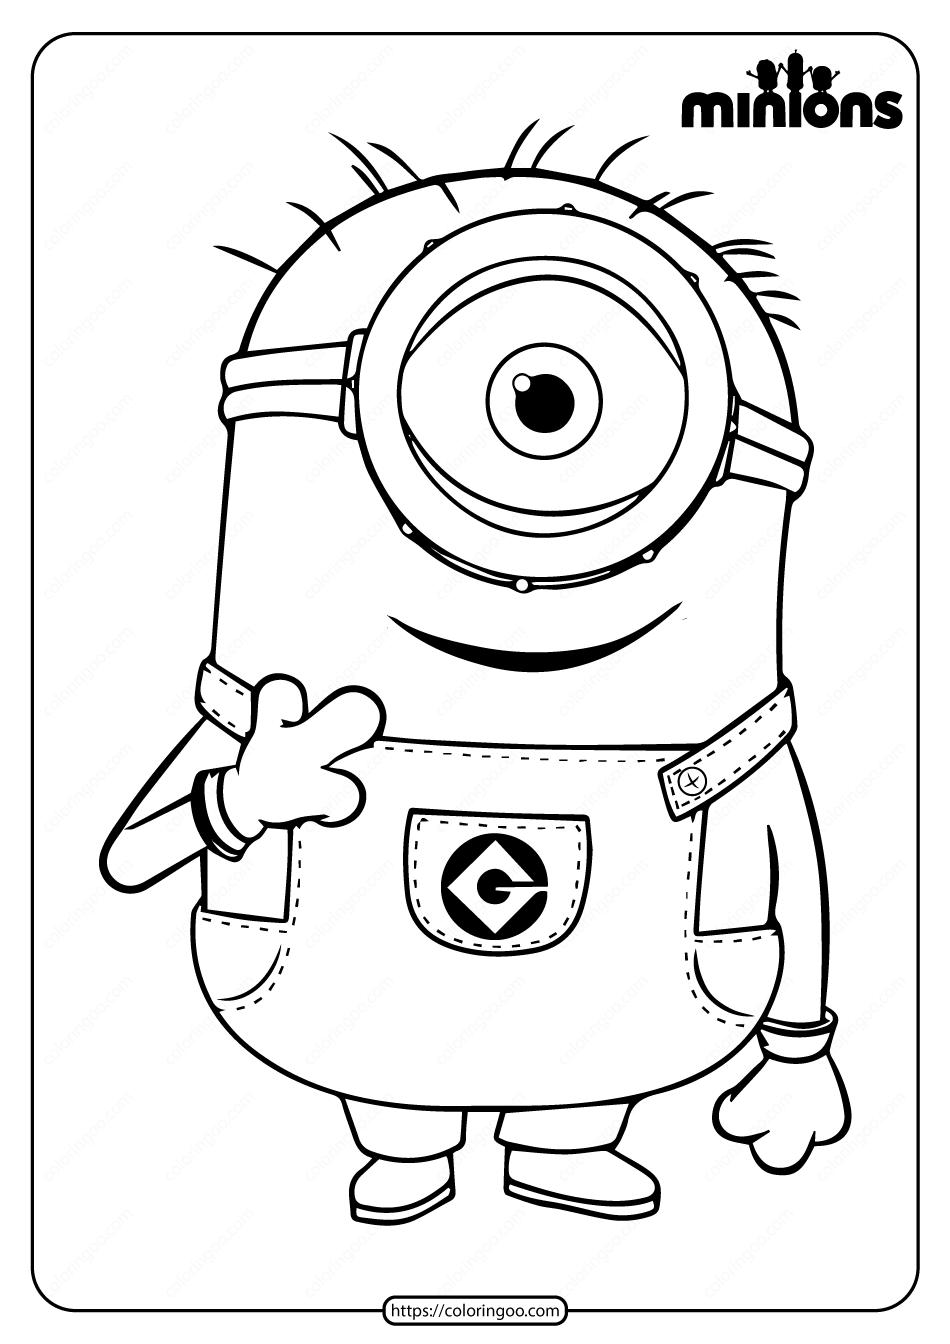 Printable Minions Carl Pdf Coloring Page in 2020 | Minion ...